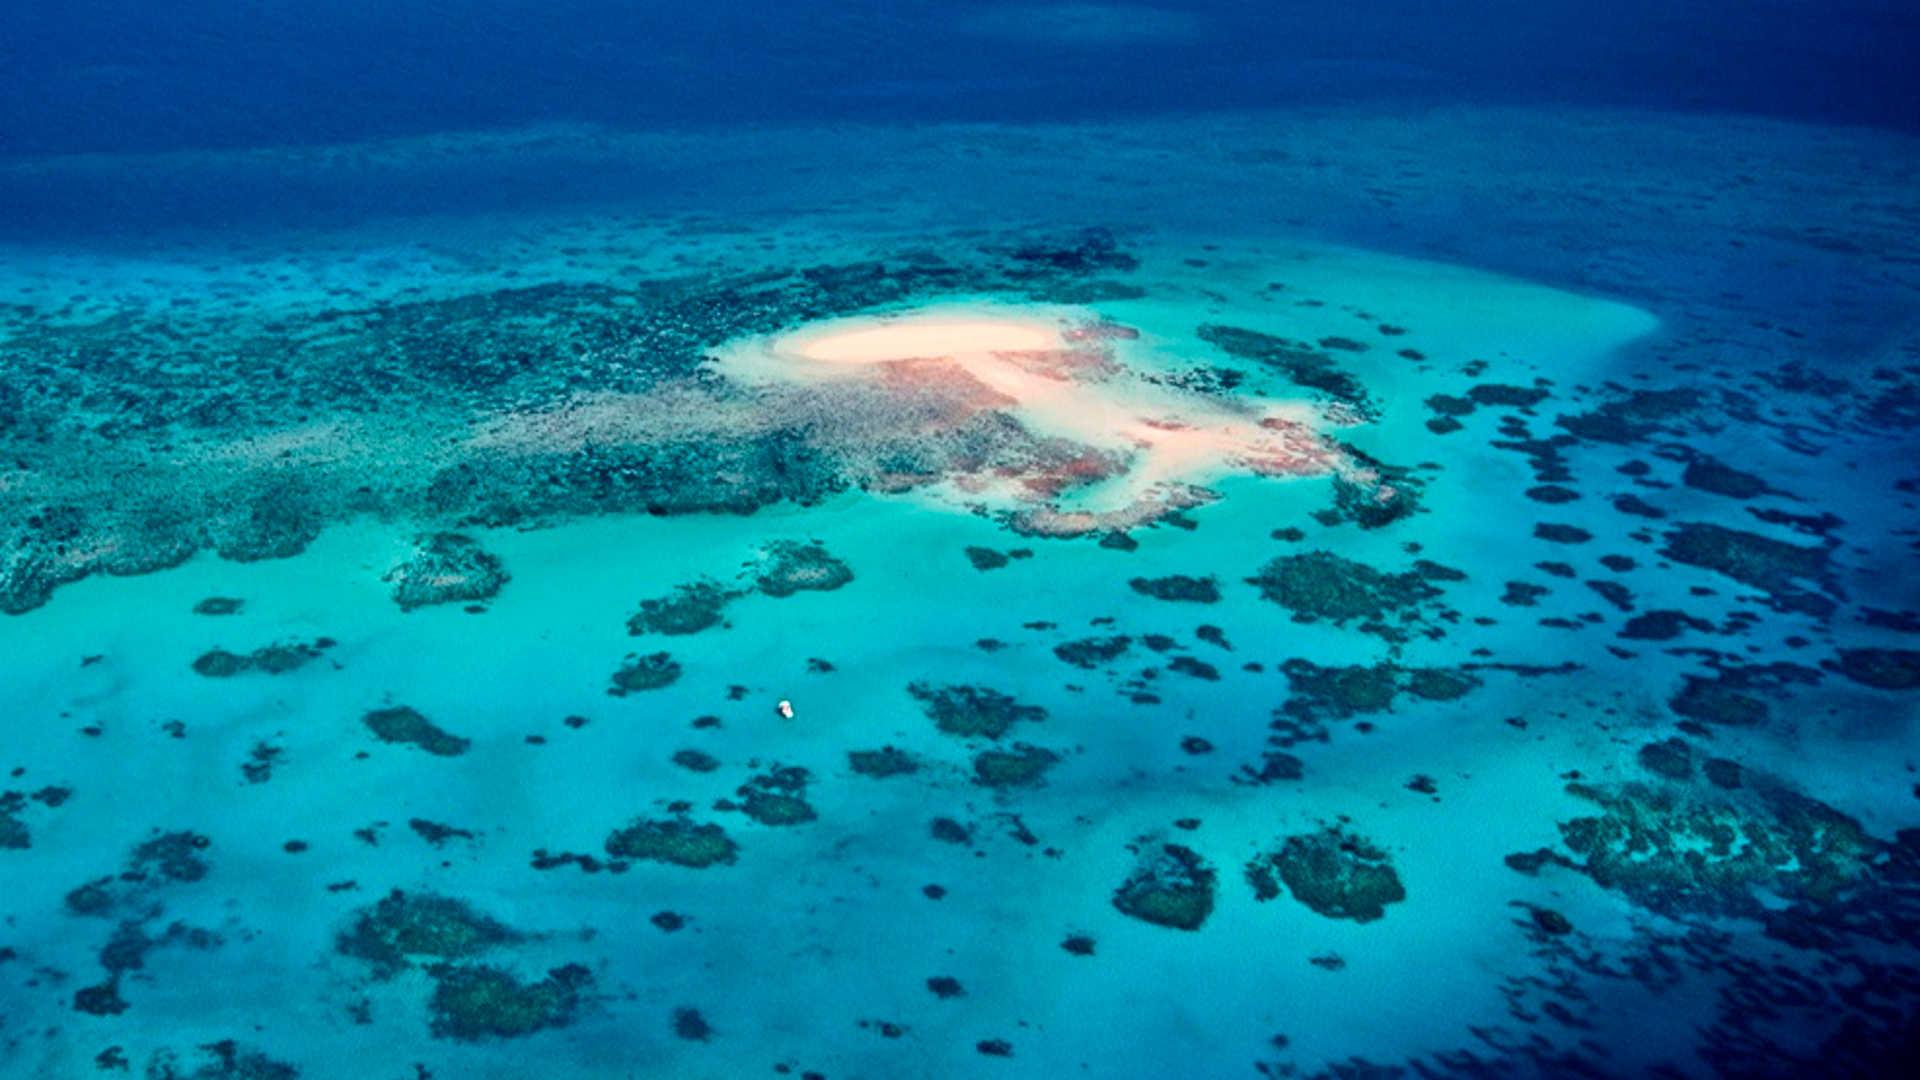 Vlassof Reef